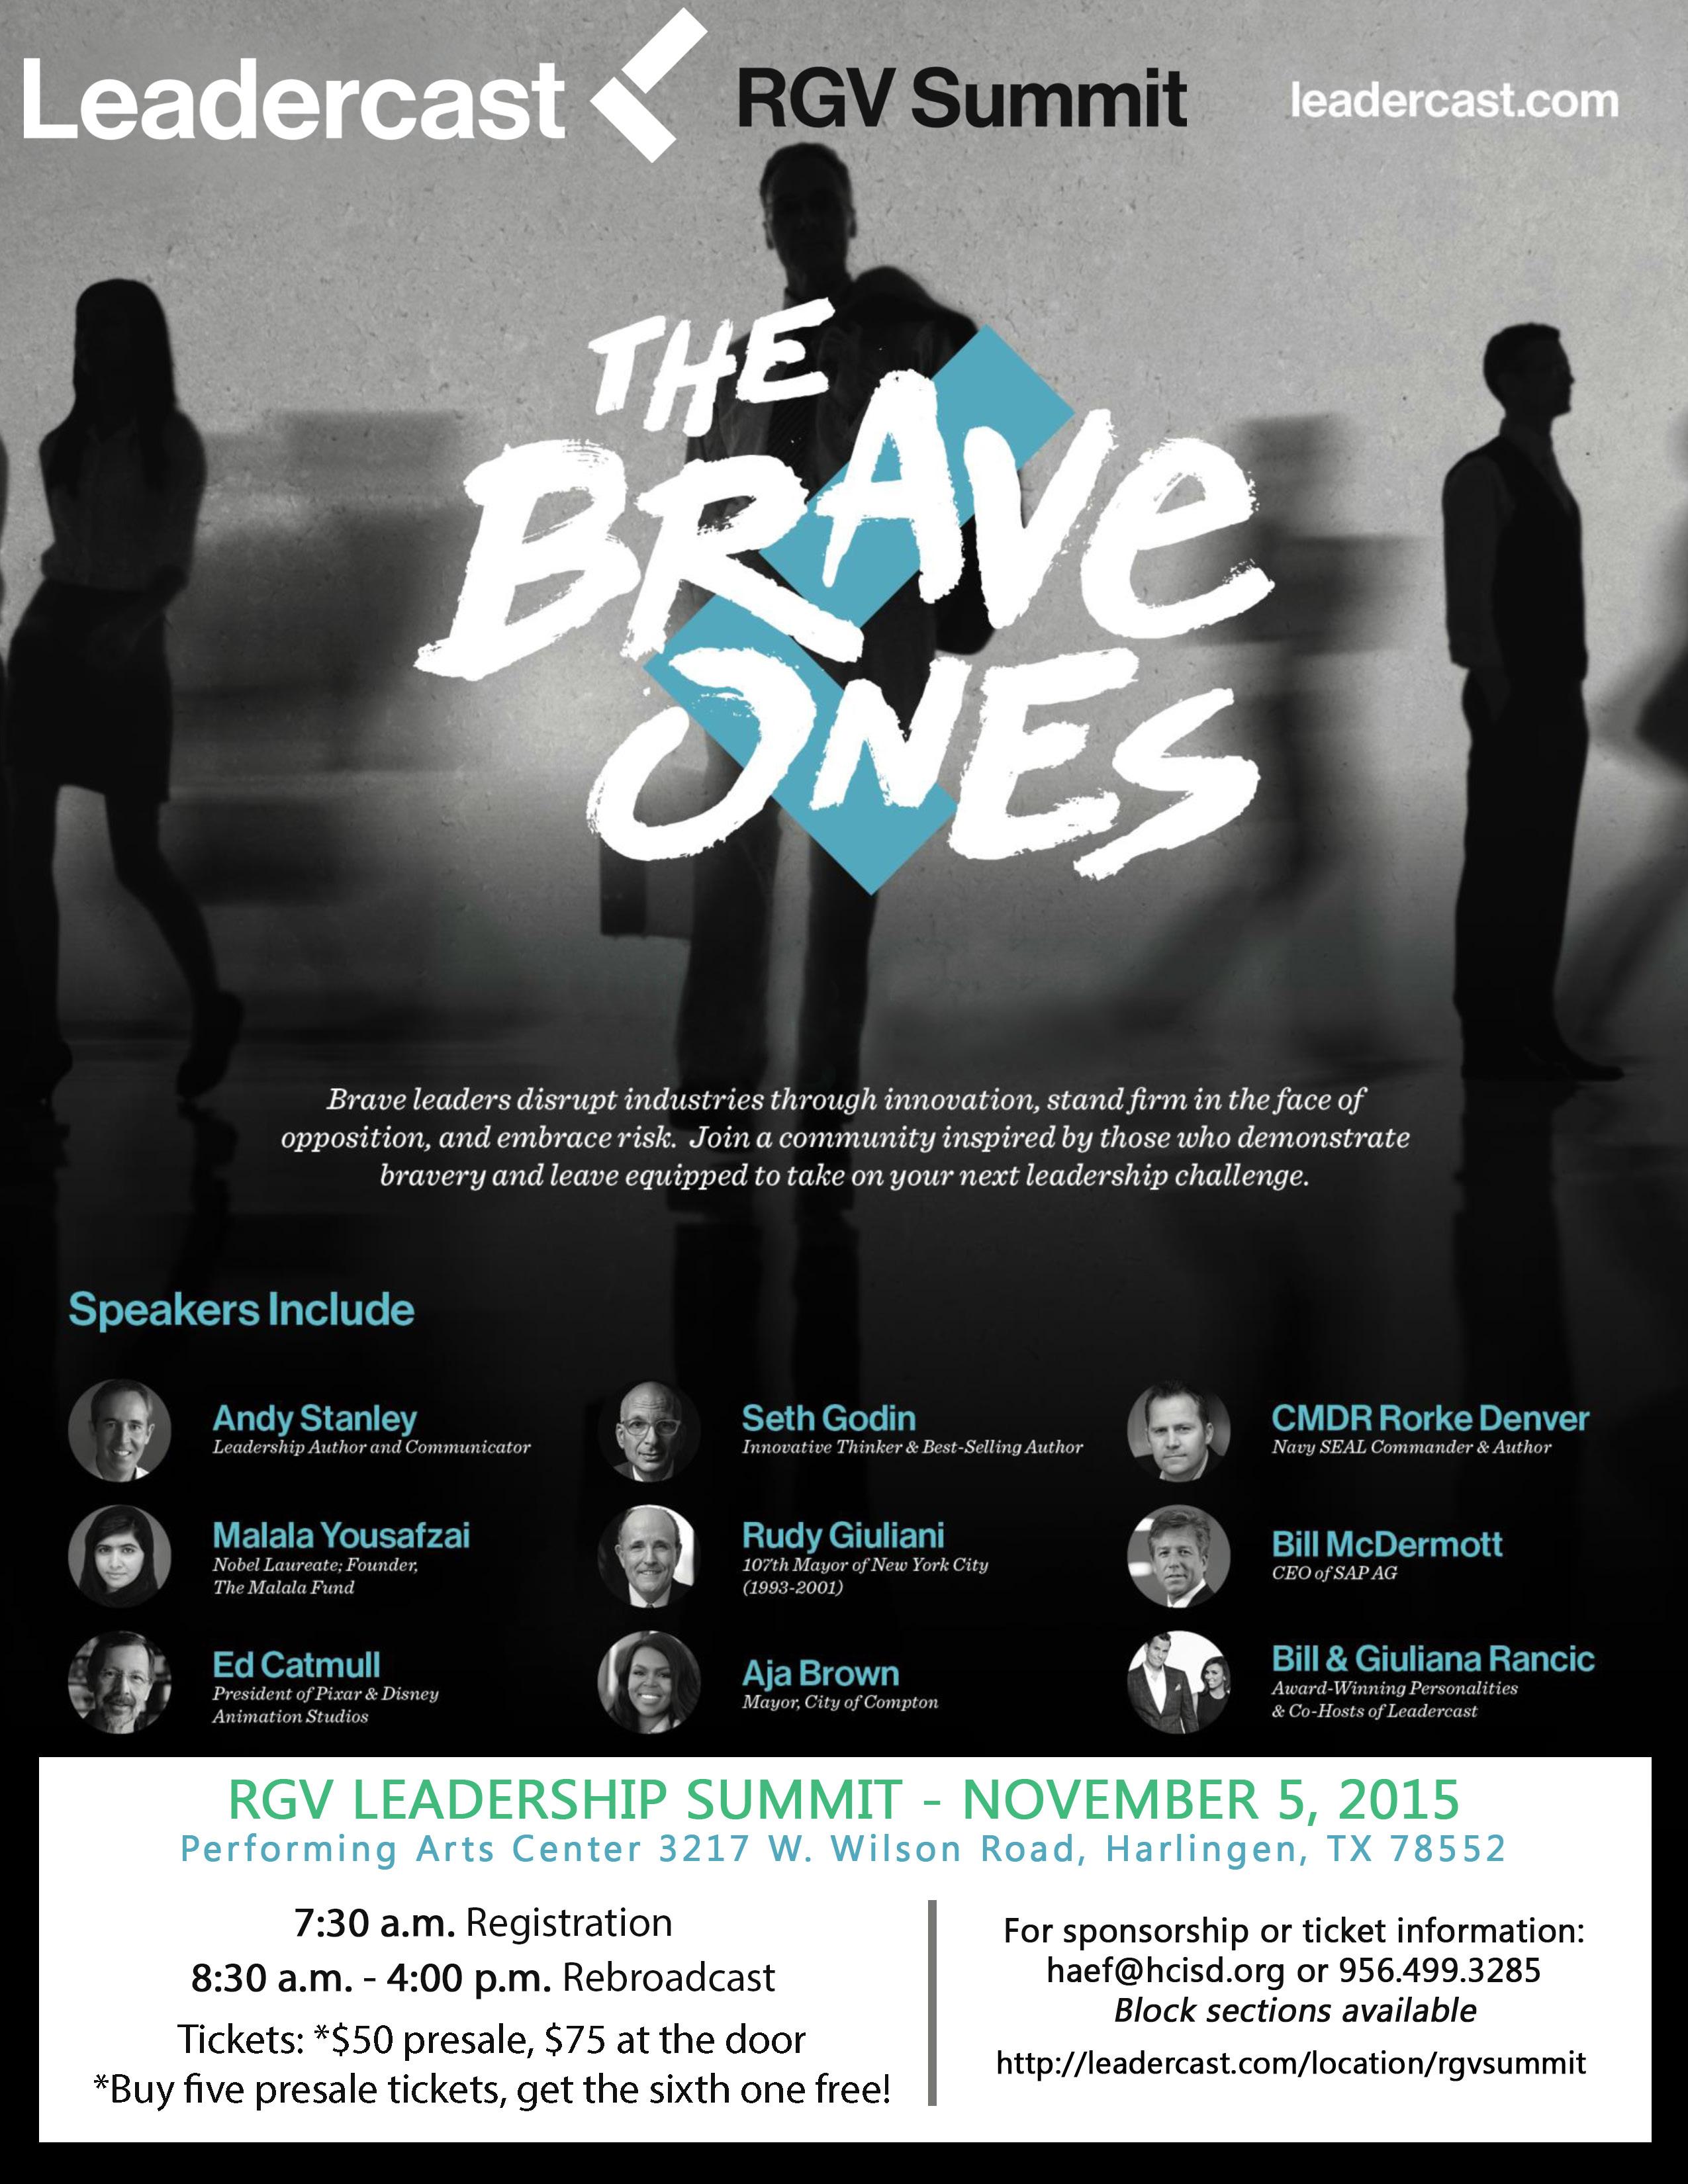 Community invited to RGV Leadercast Summit